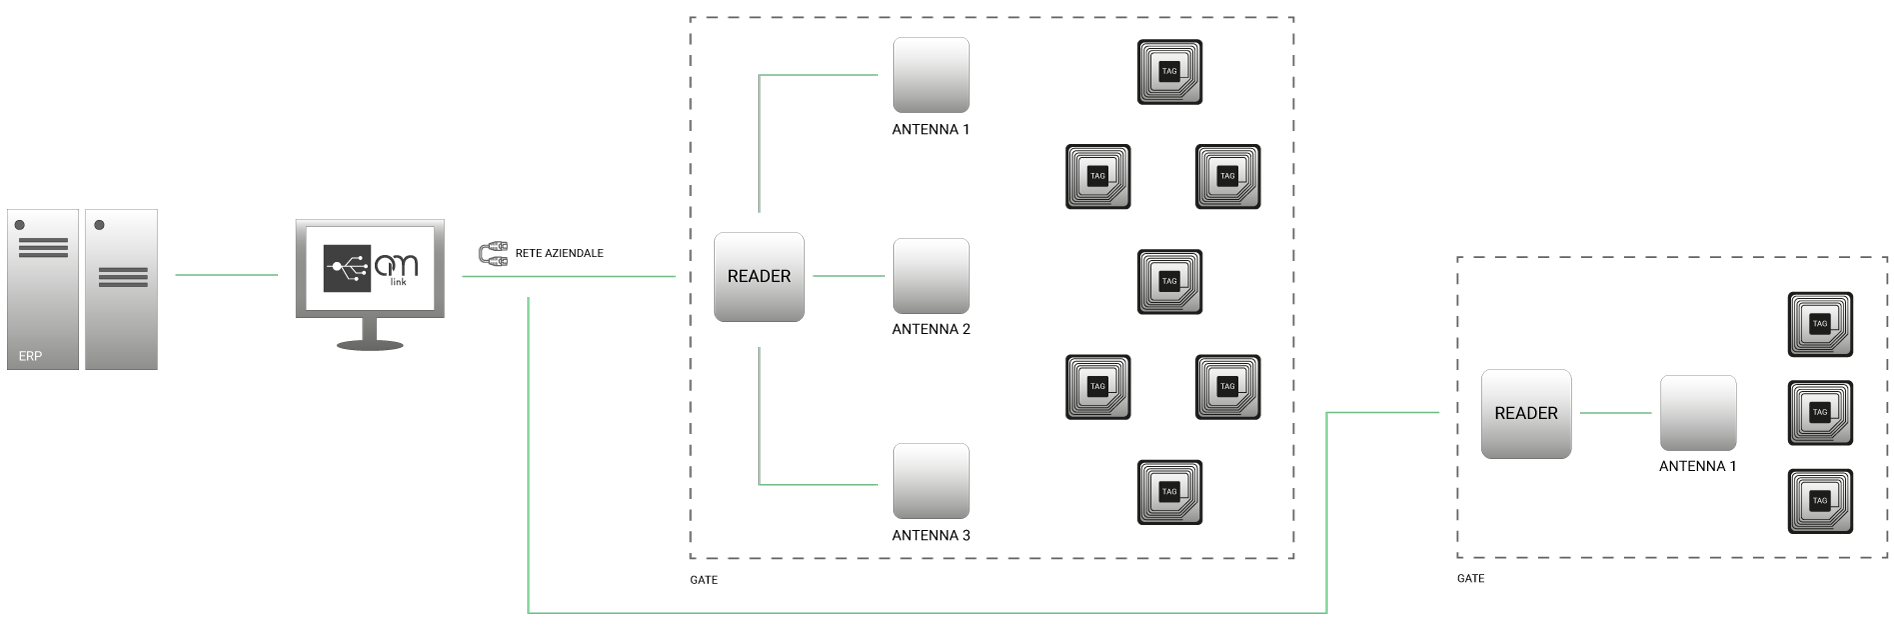 Infrastruttura comunicazione sistema RFID